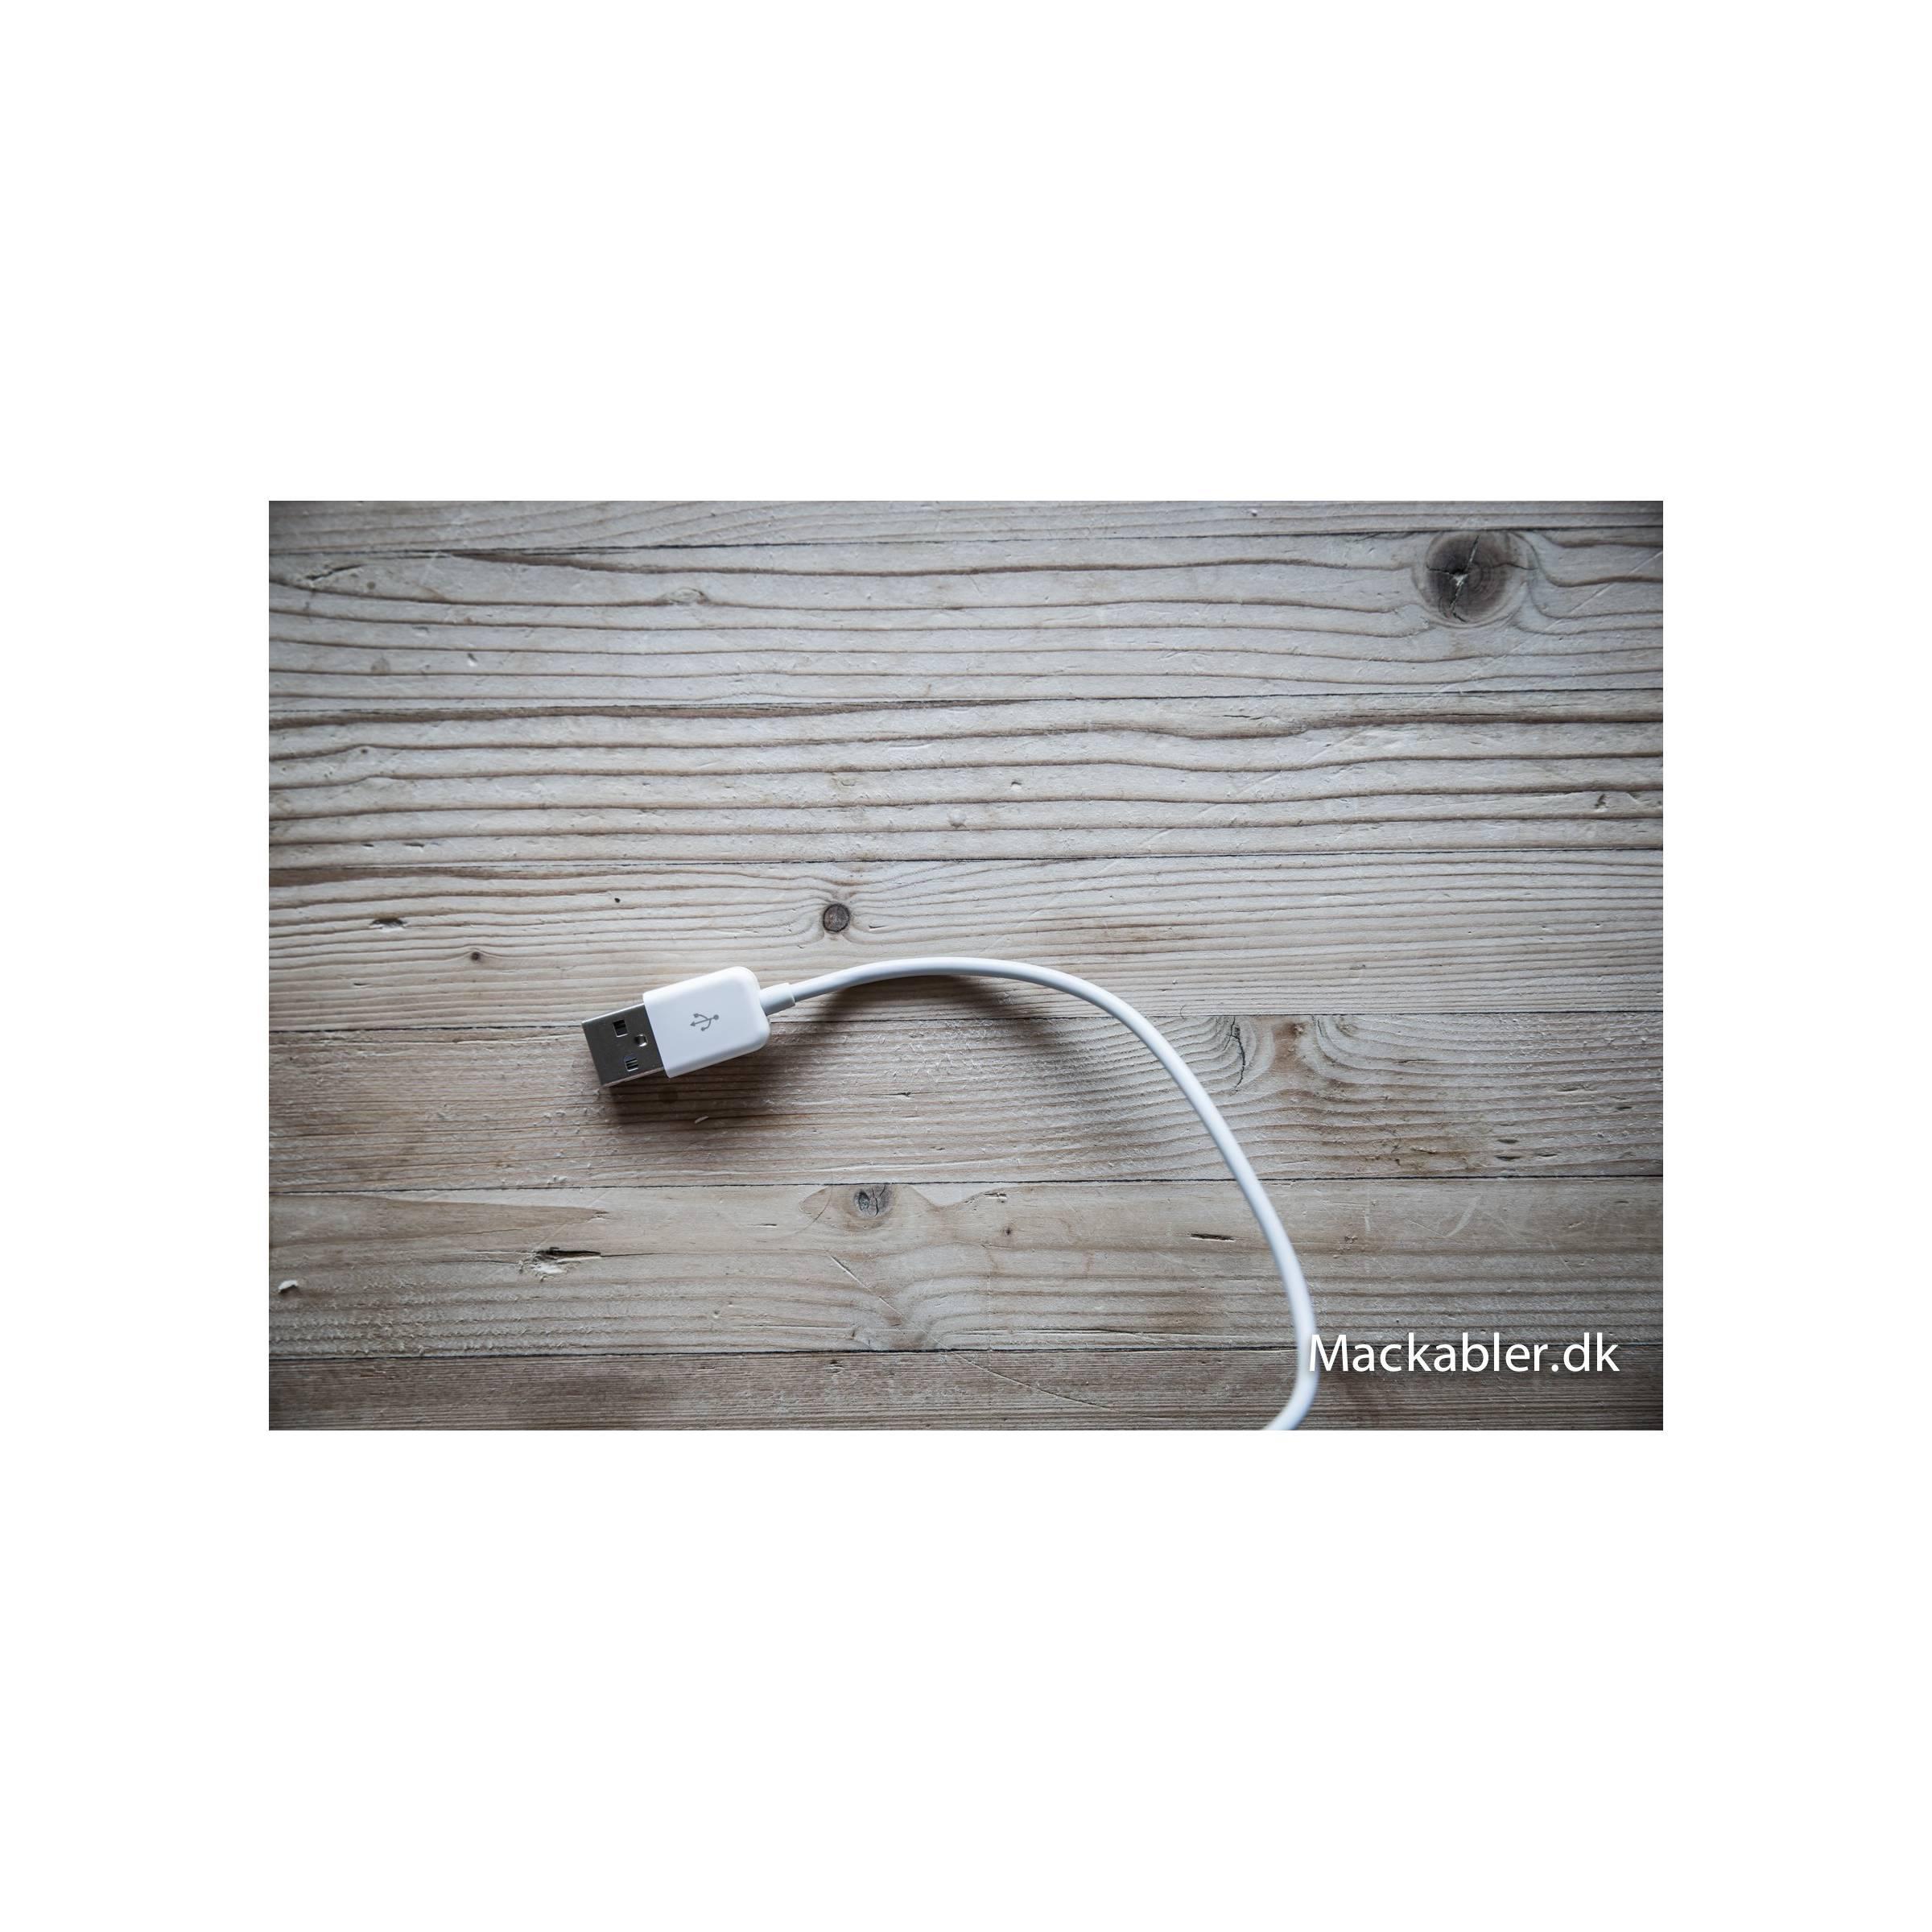 Bilde av 30-pin Dock Kabel Iphone/ipad, Længde 2 Meter